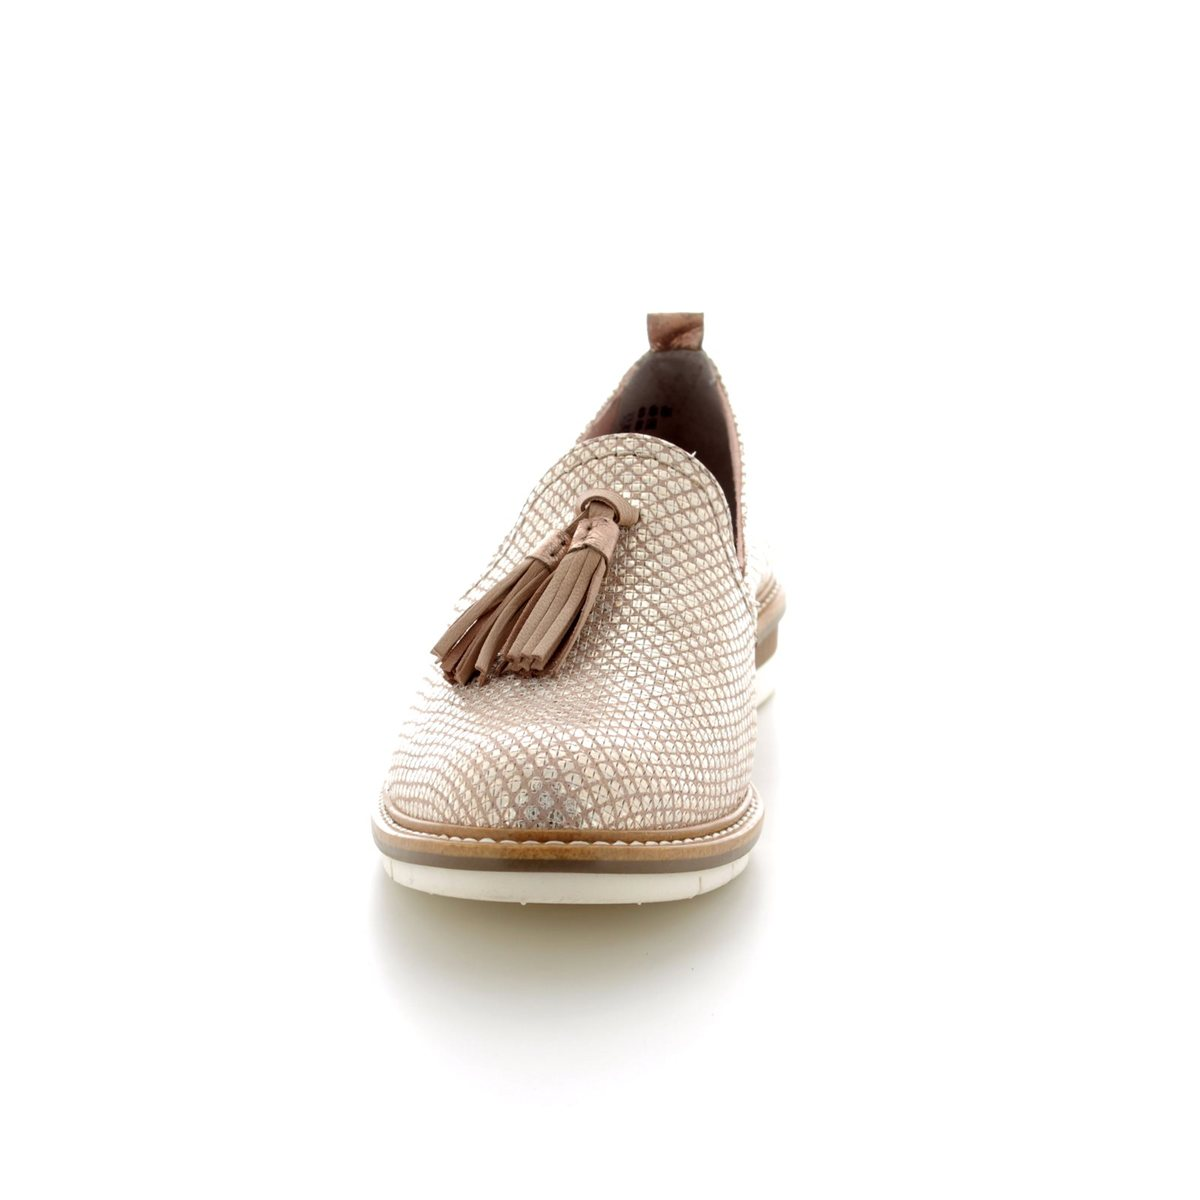 497ea78a Tamaris Kela 24300-20426 Beige multi loafers